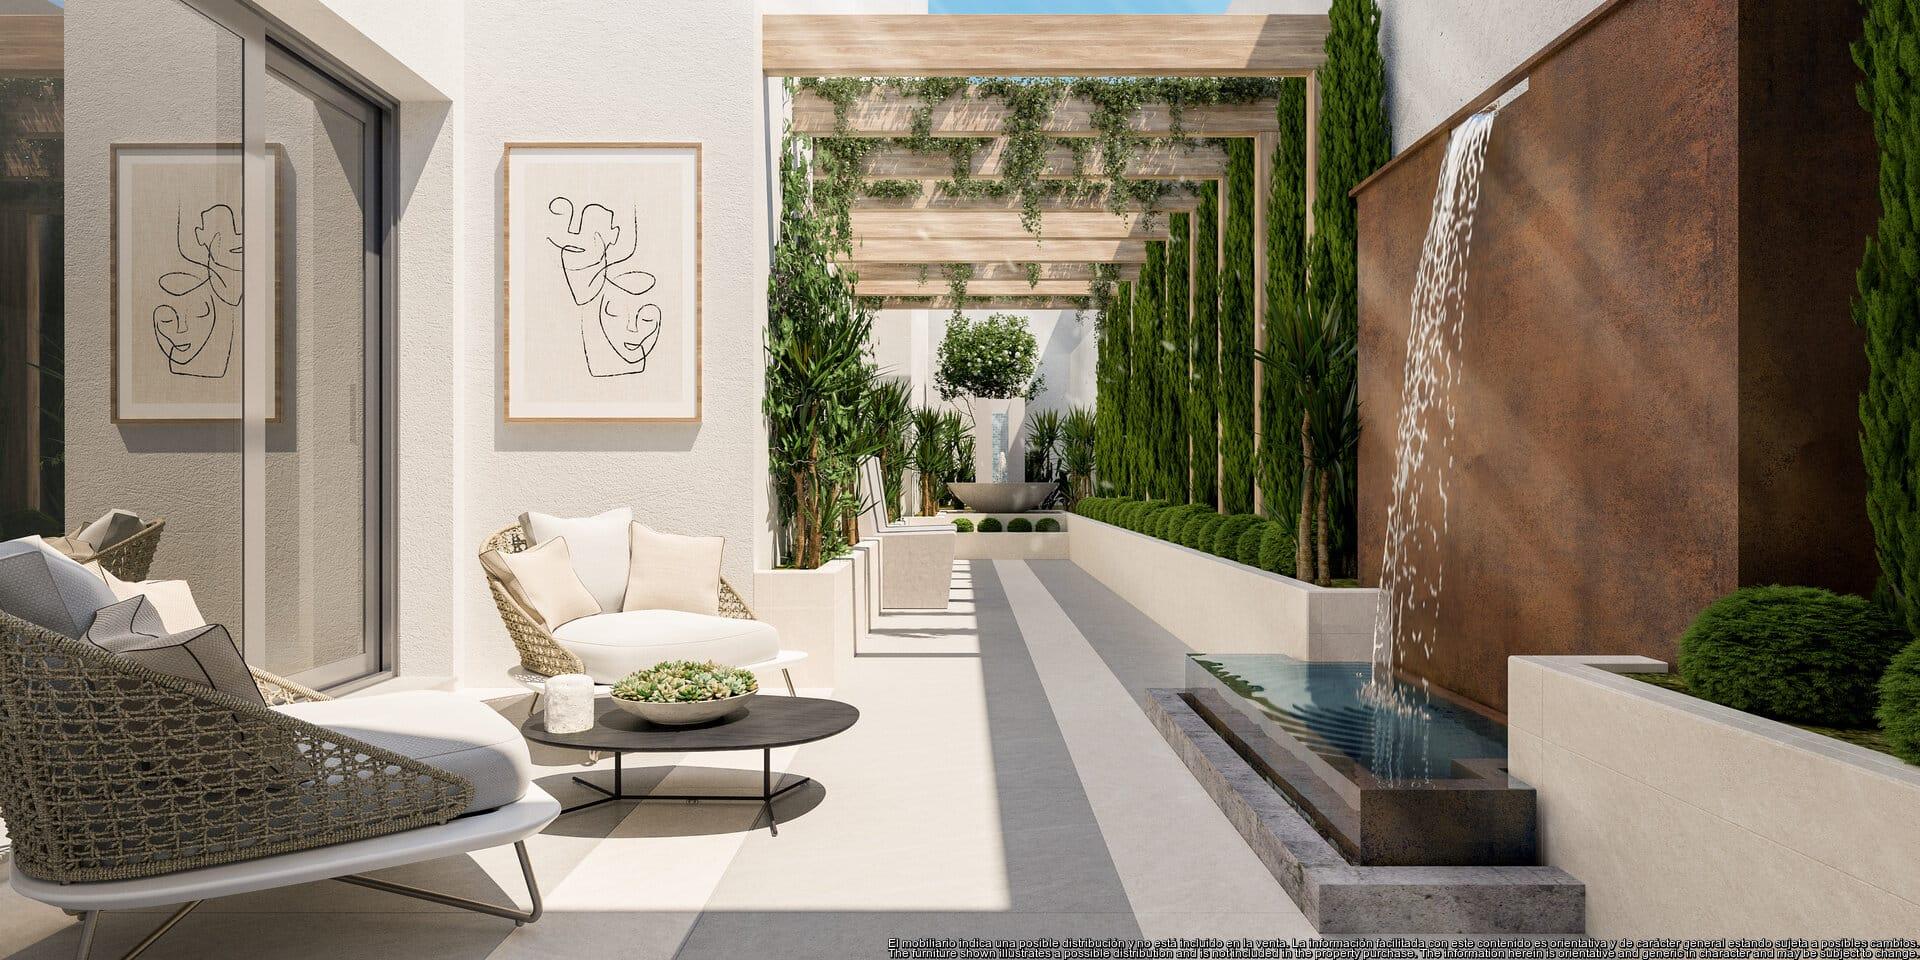 Quercus Real de la Quinta 3 bedroom corner apartment very private with open Sea and La Concha Mountain views